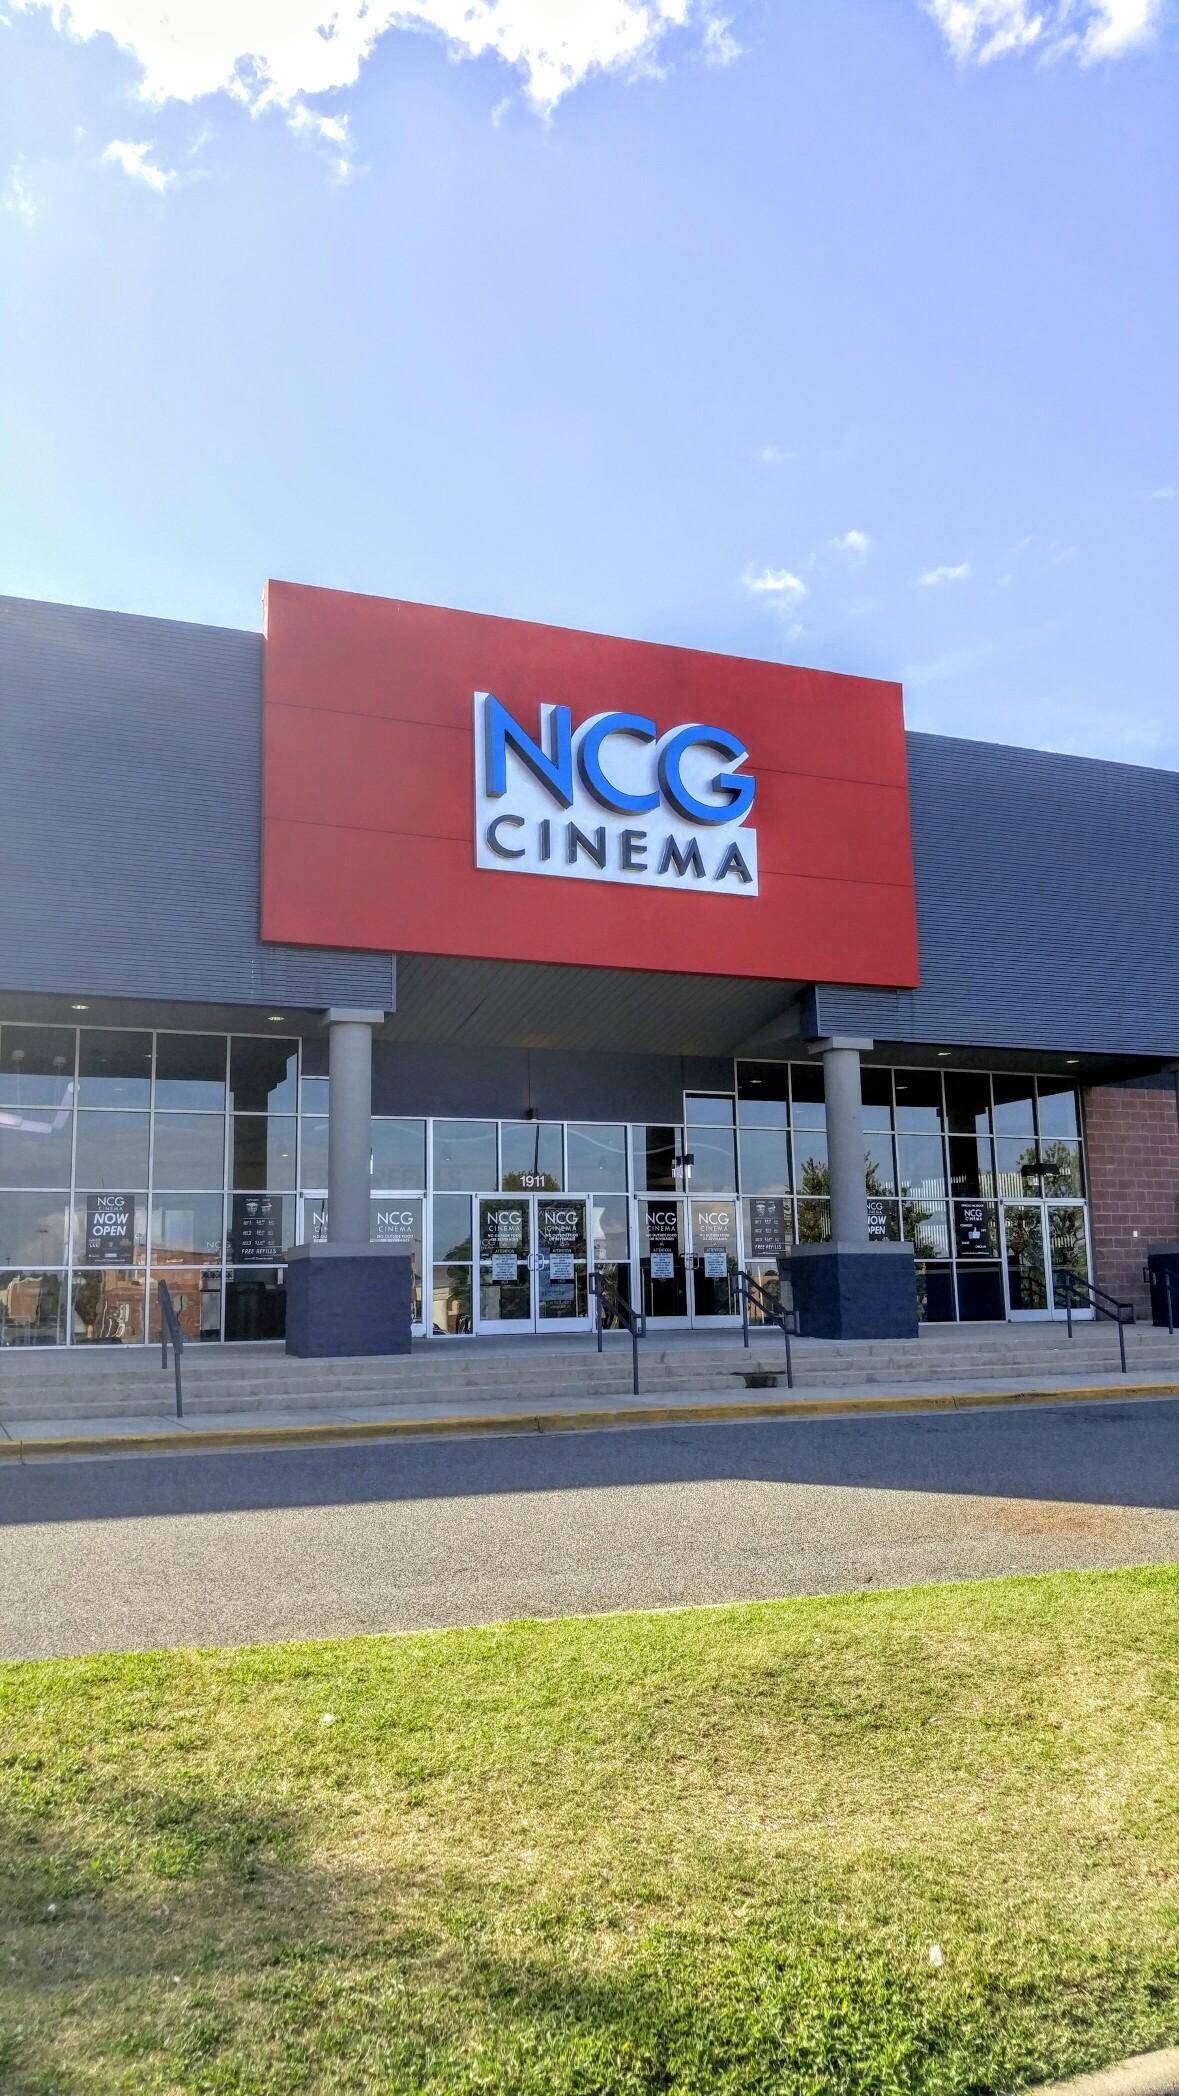 Ncg Cinemas, Monroe NC